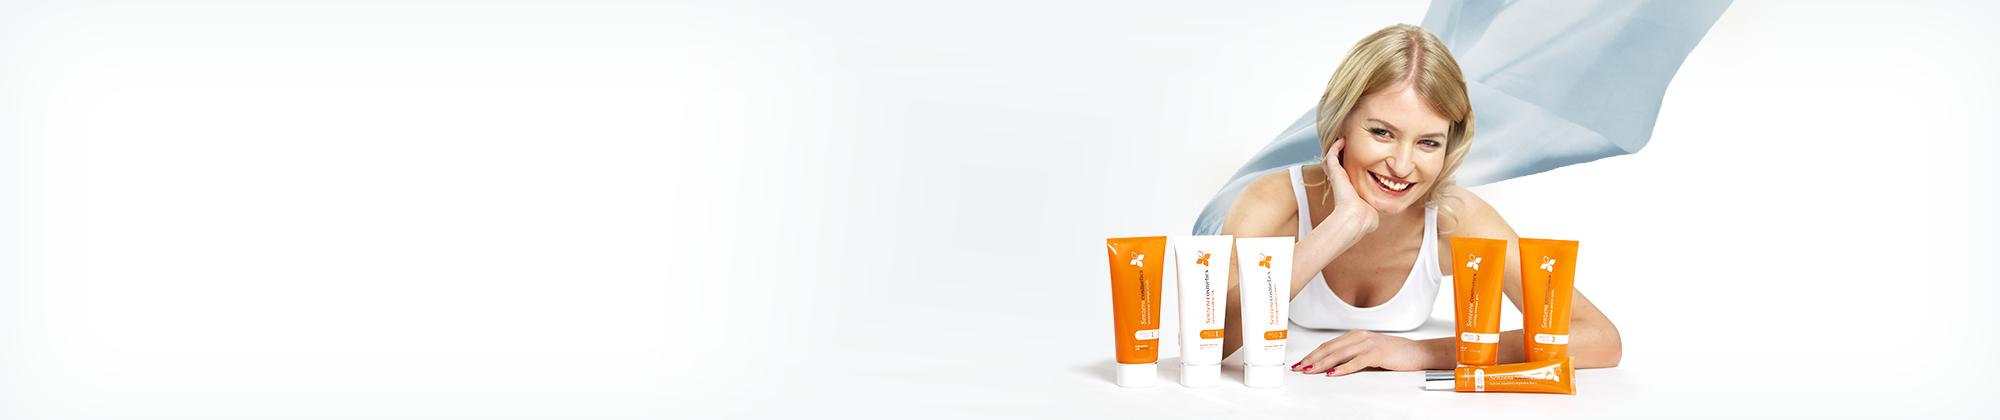 SNZ-00215-Head-Leistung-Cosmetics-Org.png